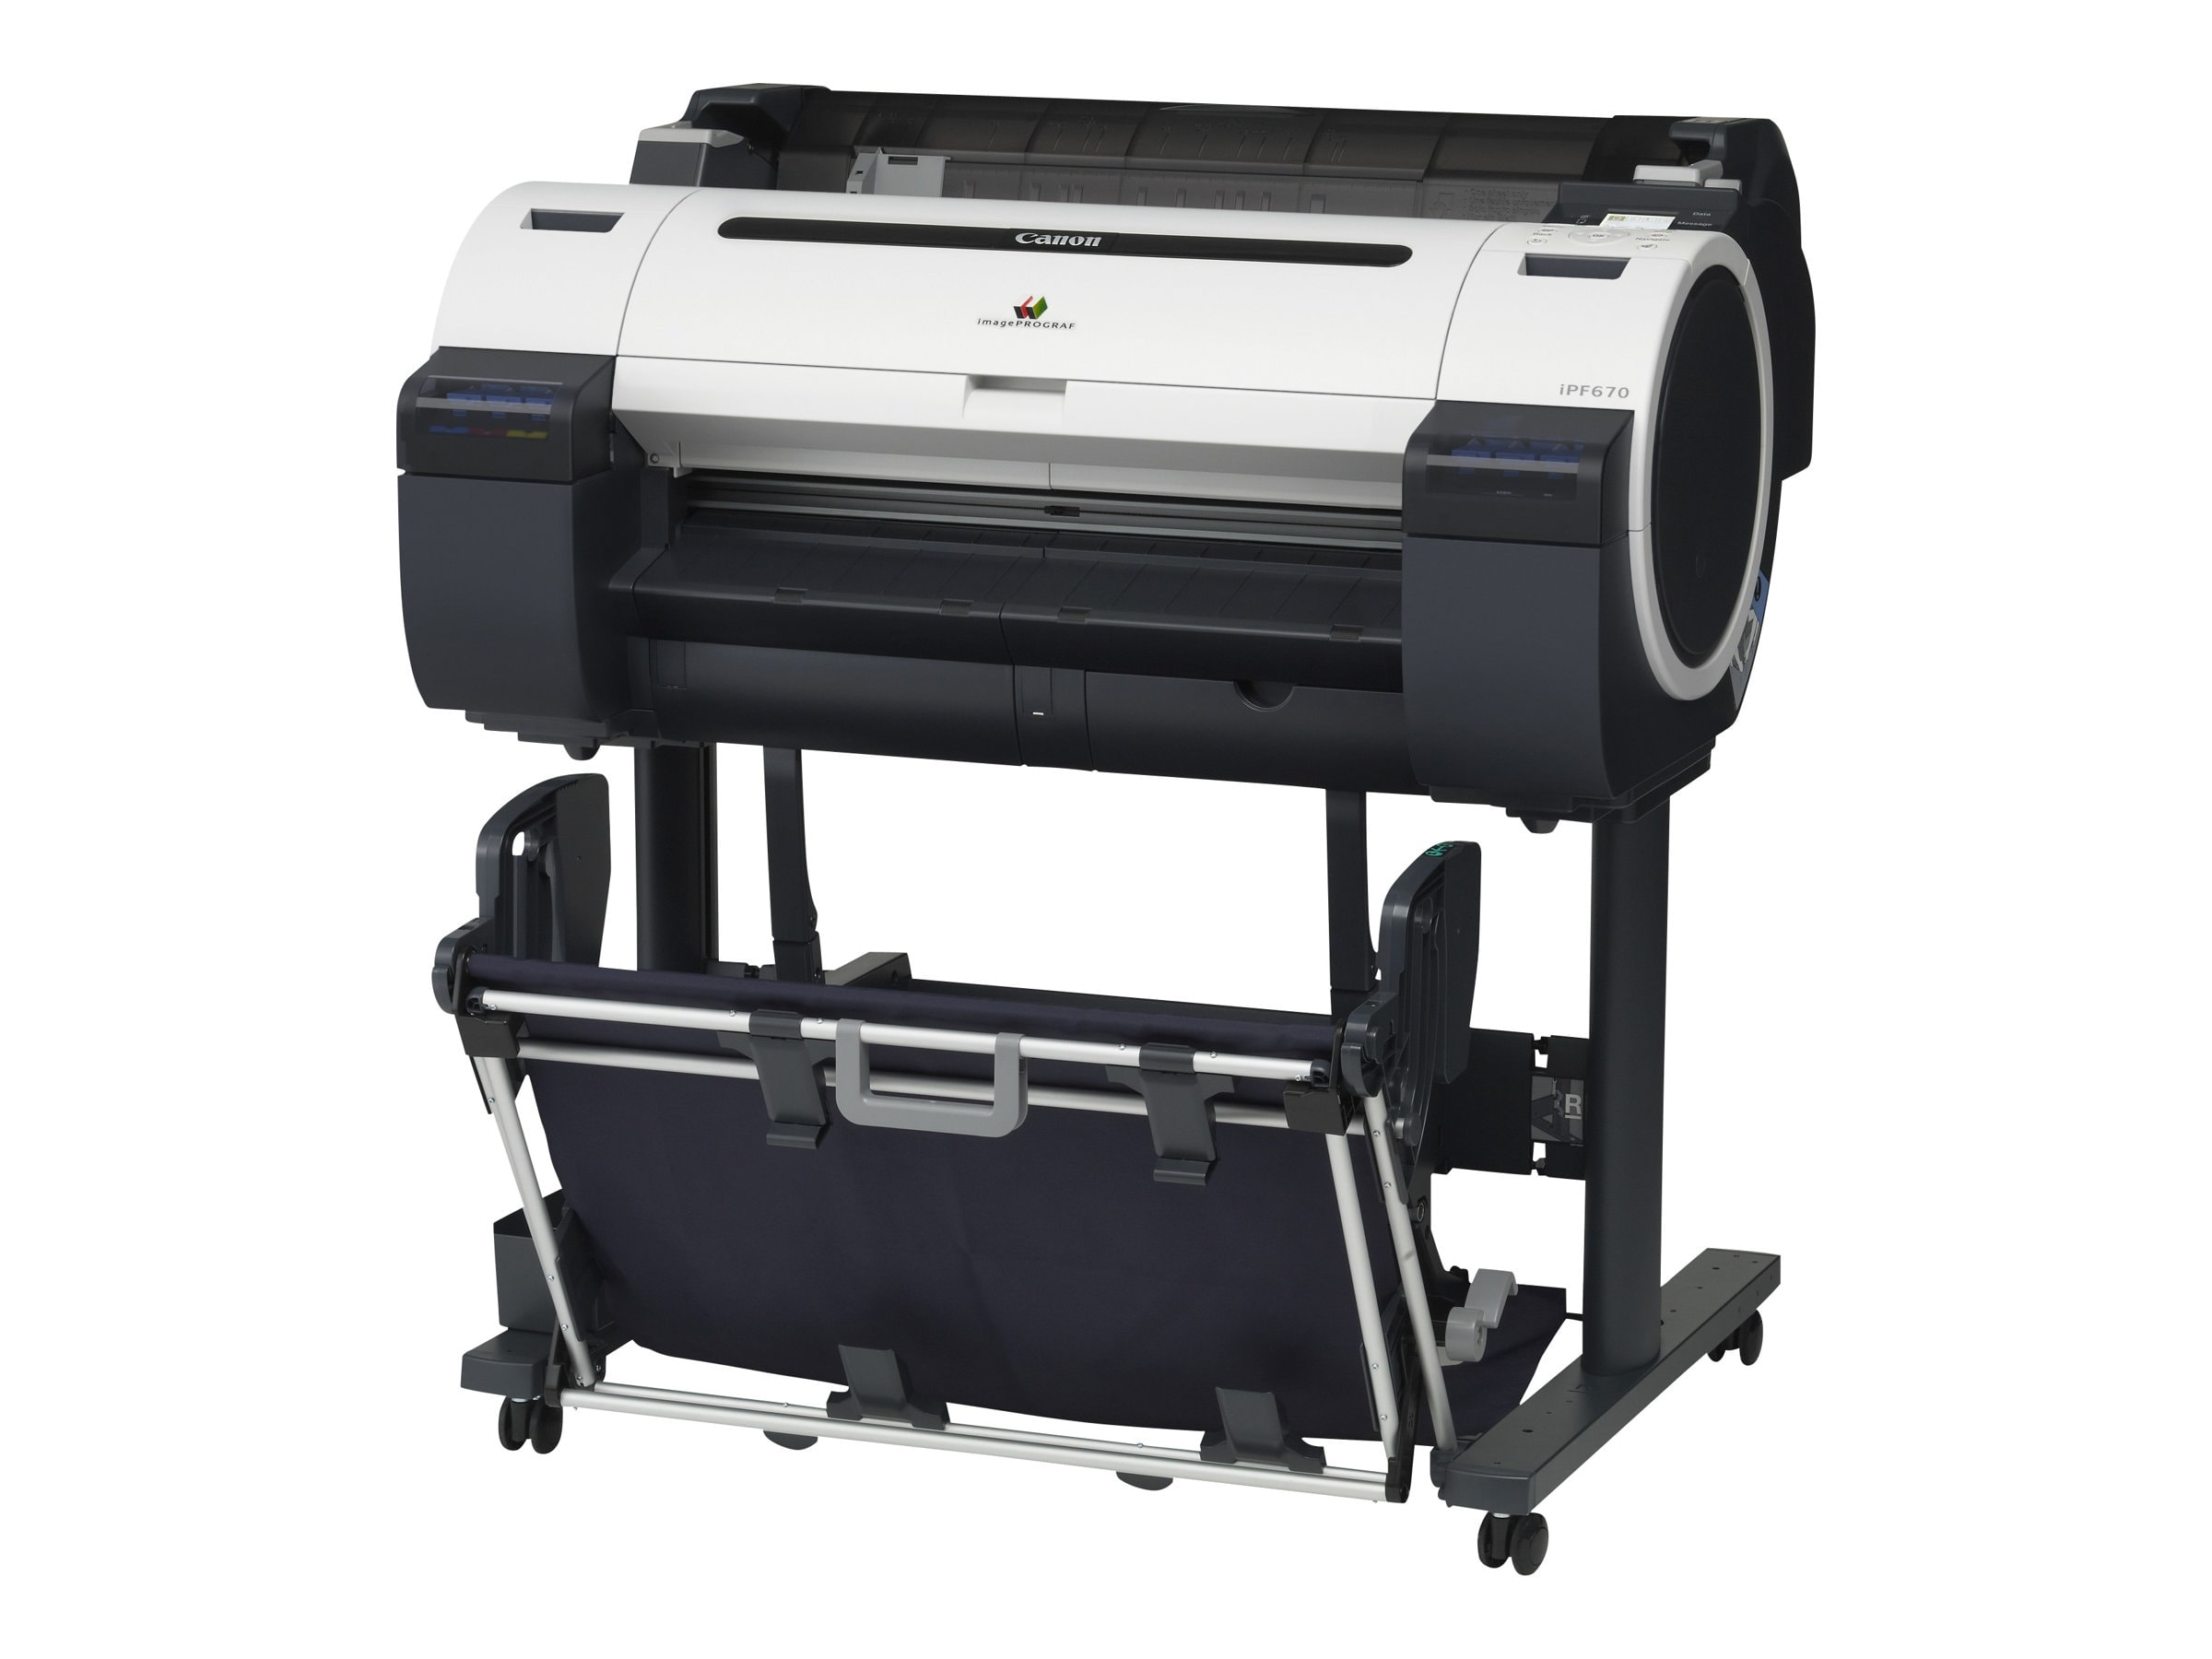 Imprimante Canon ImagePROGRAF iPF670 - Cybertek.fr - 0